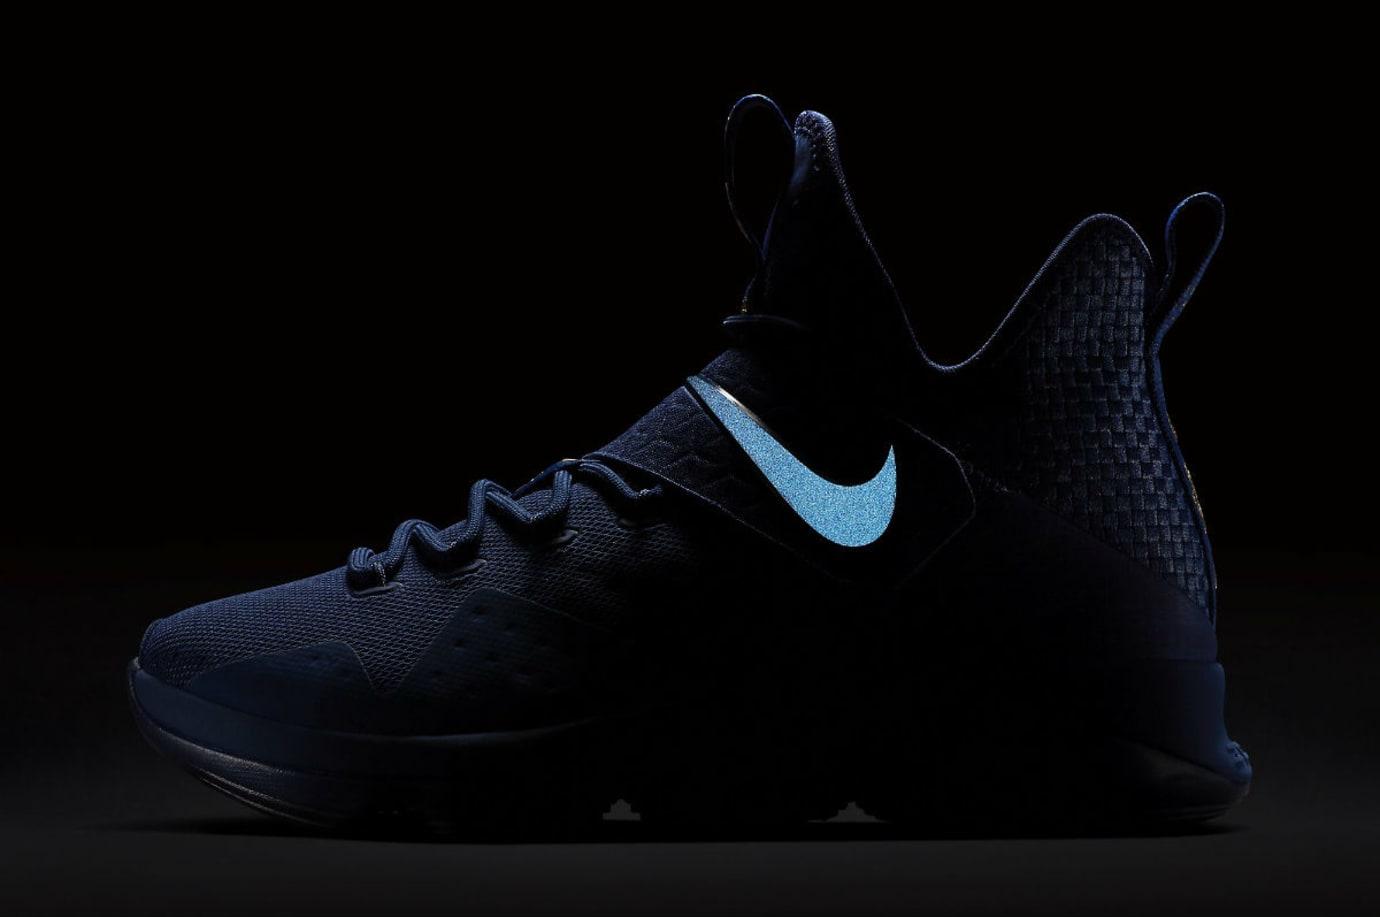 Nike LeBron 14 Agimat U.S. Release Date 3M 852402-400